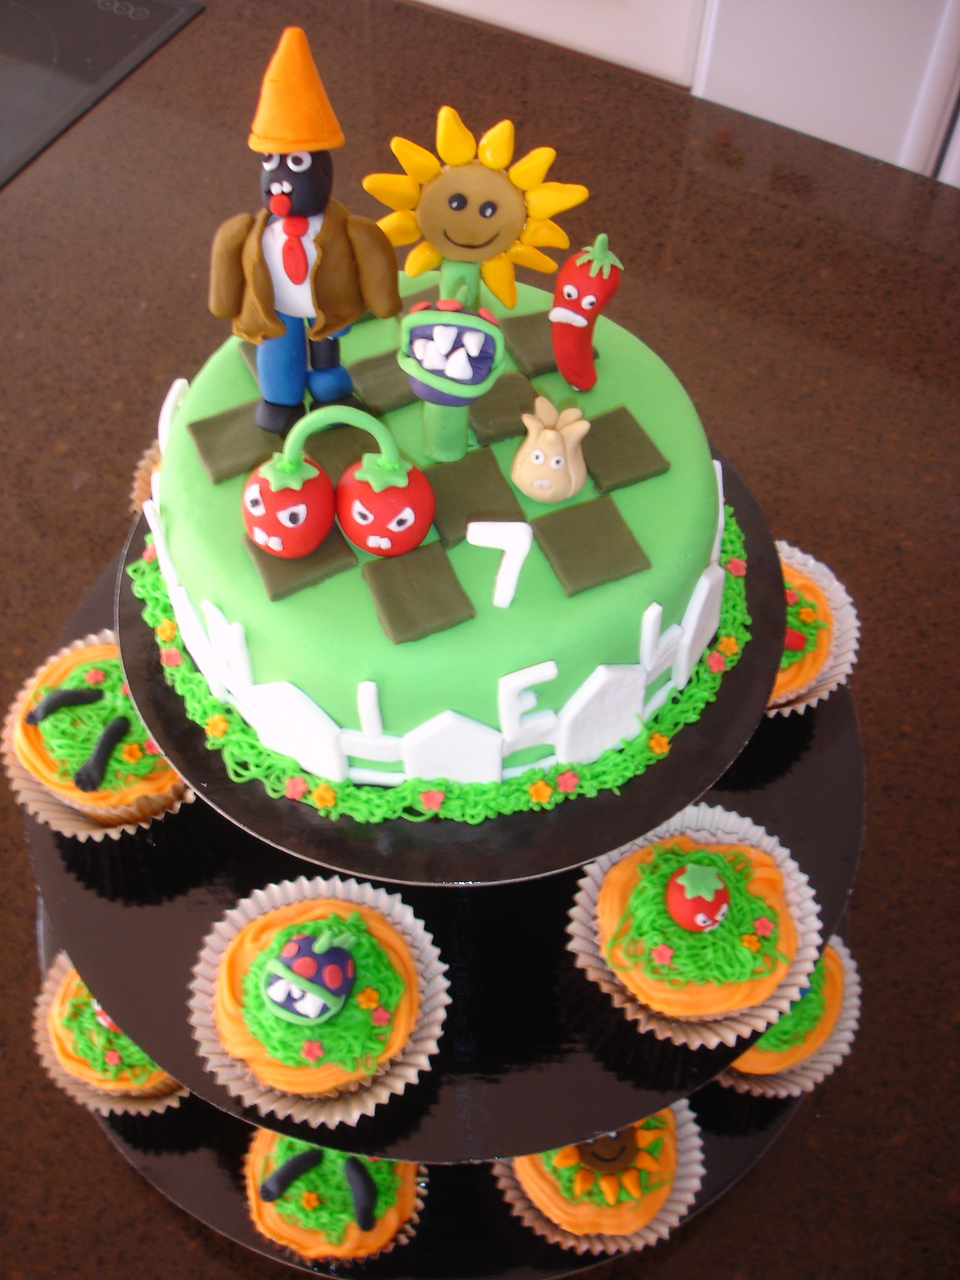 Bake Me Blind Gluten Free Plants Vs Zombies Cake